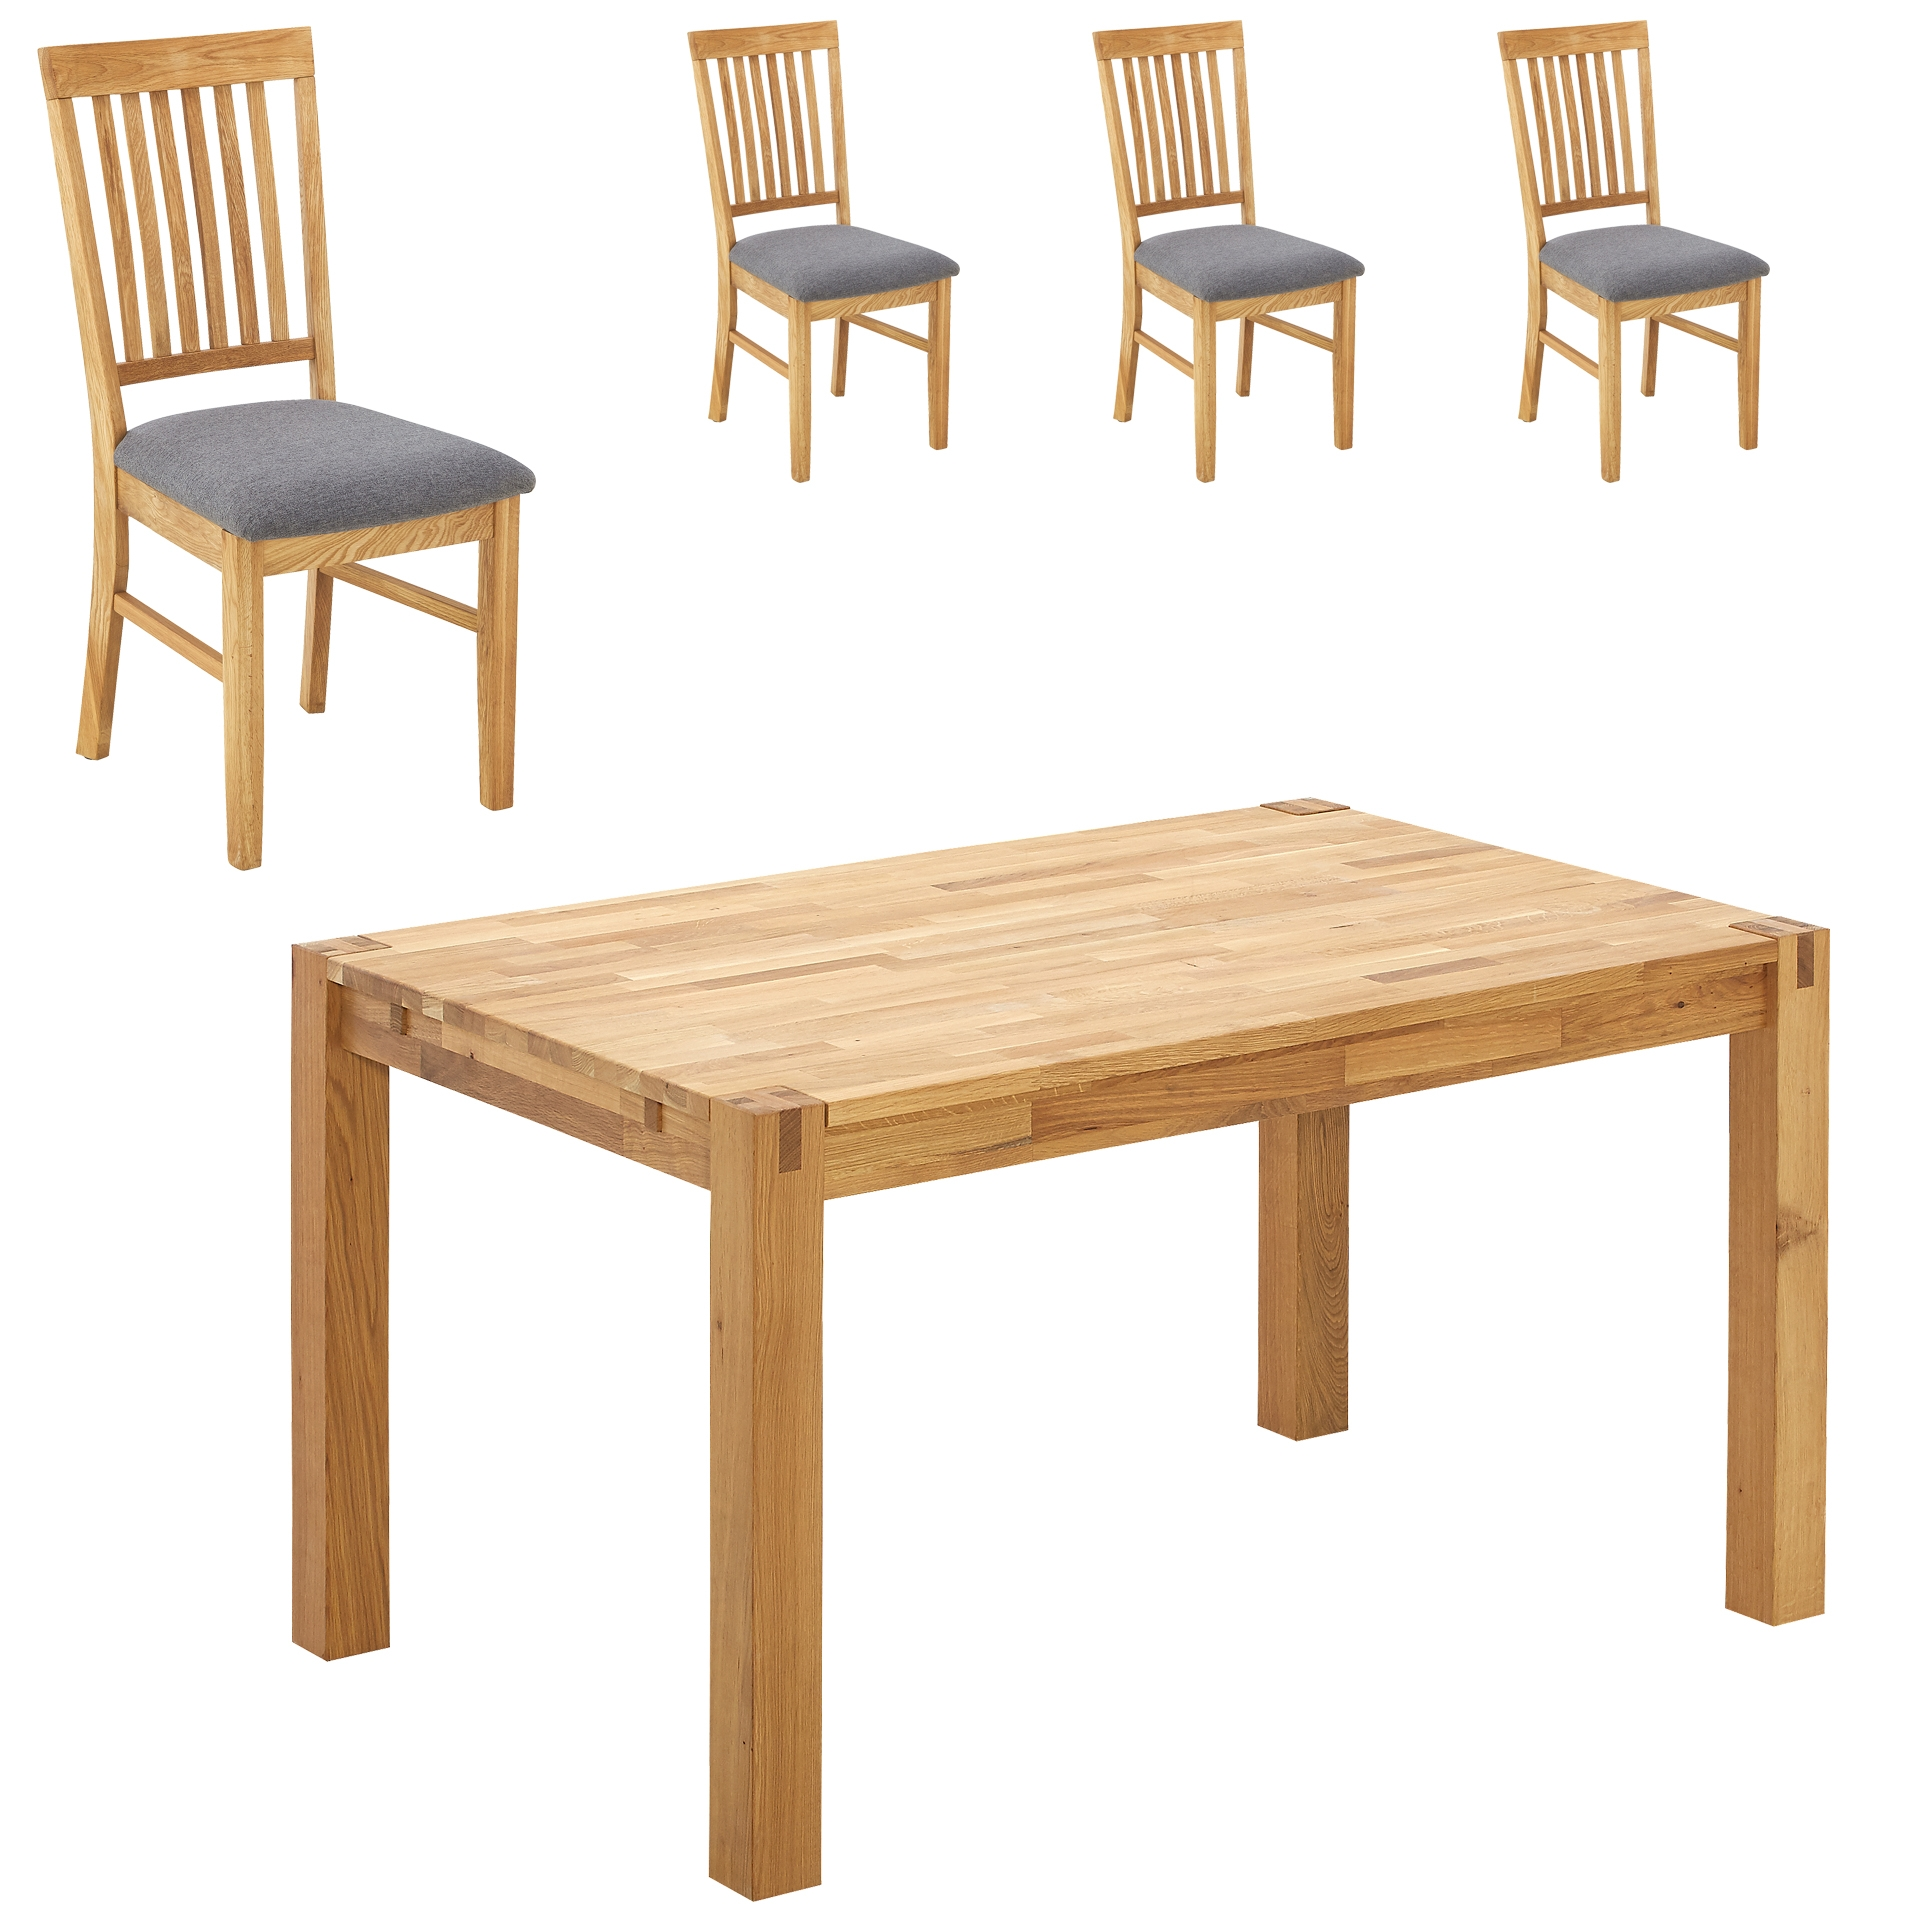 Essgruppe Royal Oak (90x140, 4 Stühle, grau)